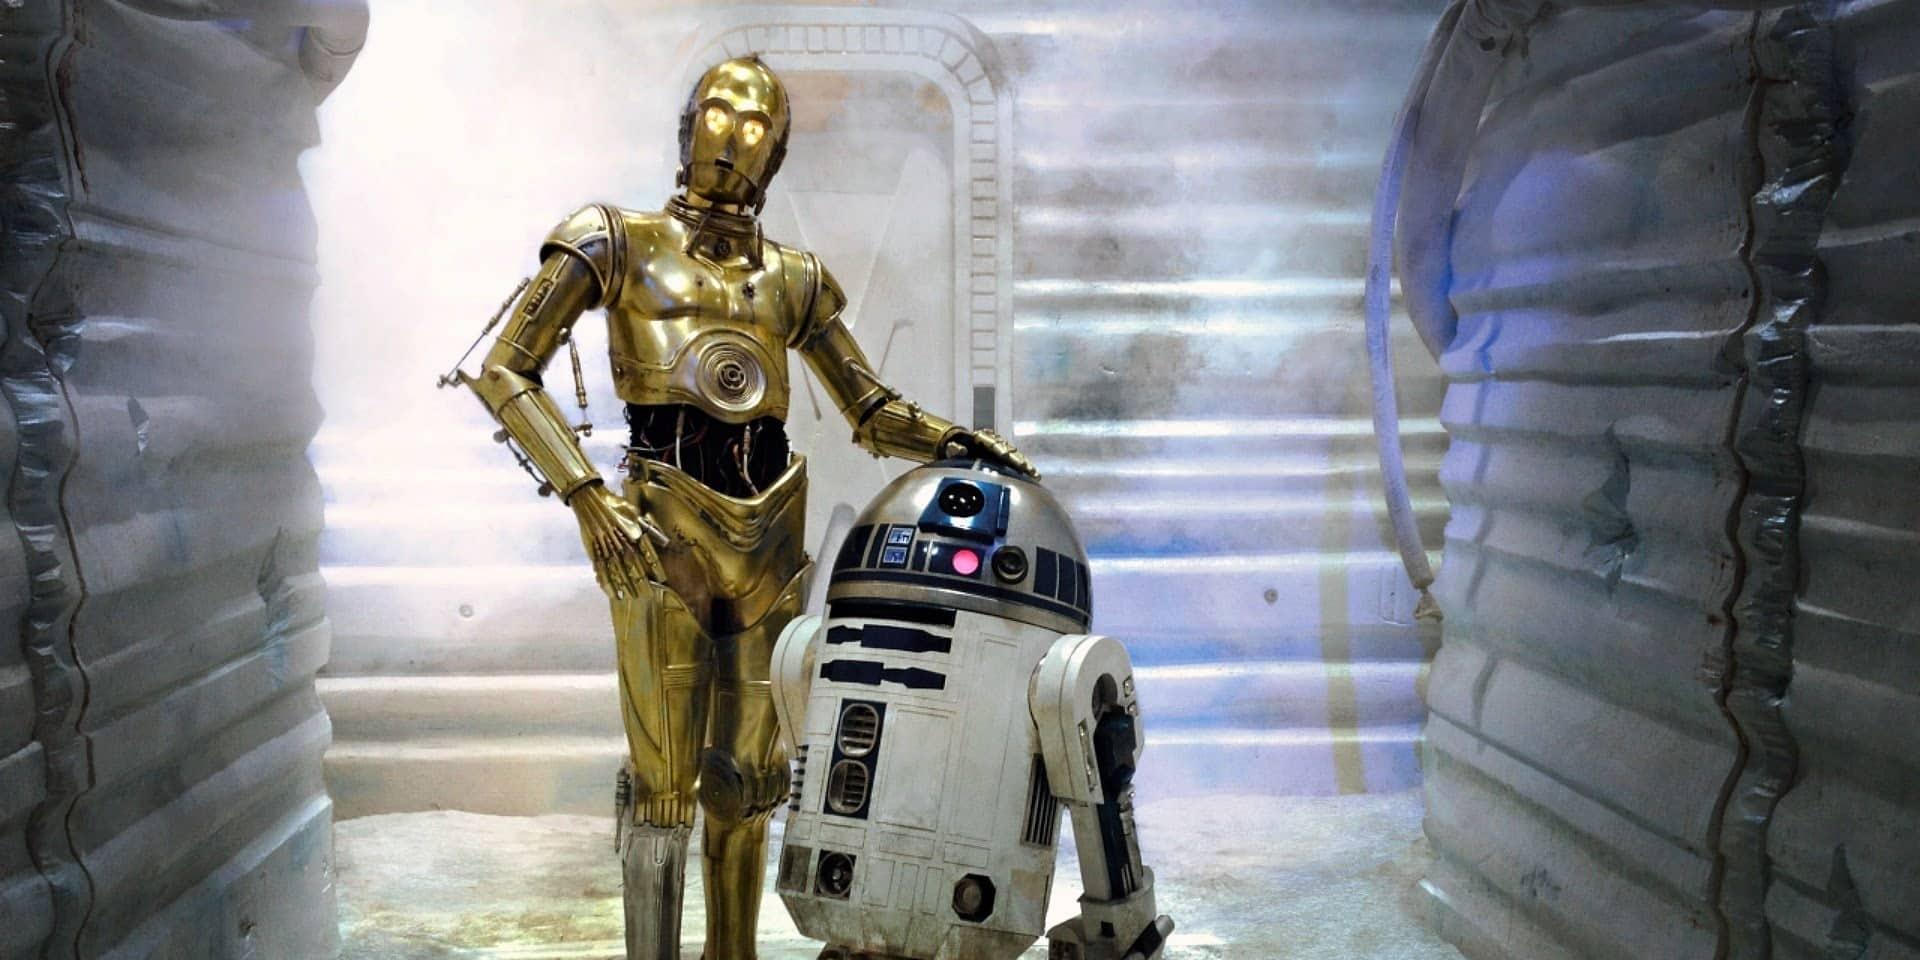 Did Disney just confirm a major Star Wars Land rumor?